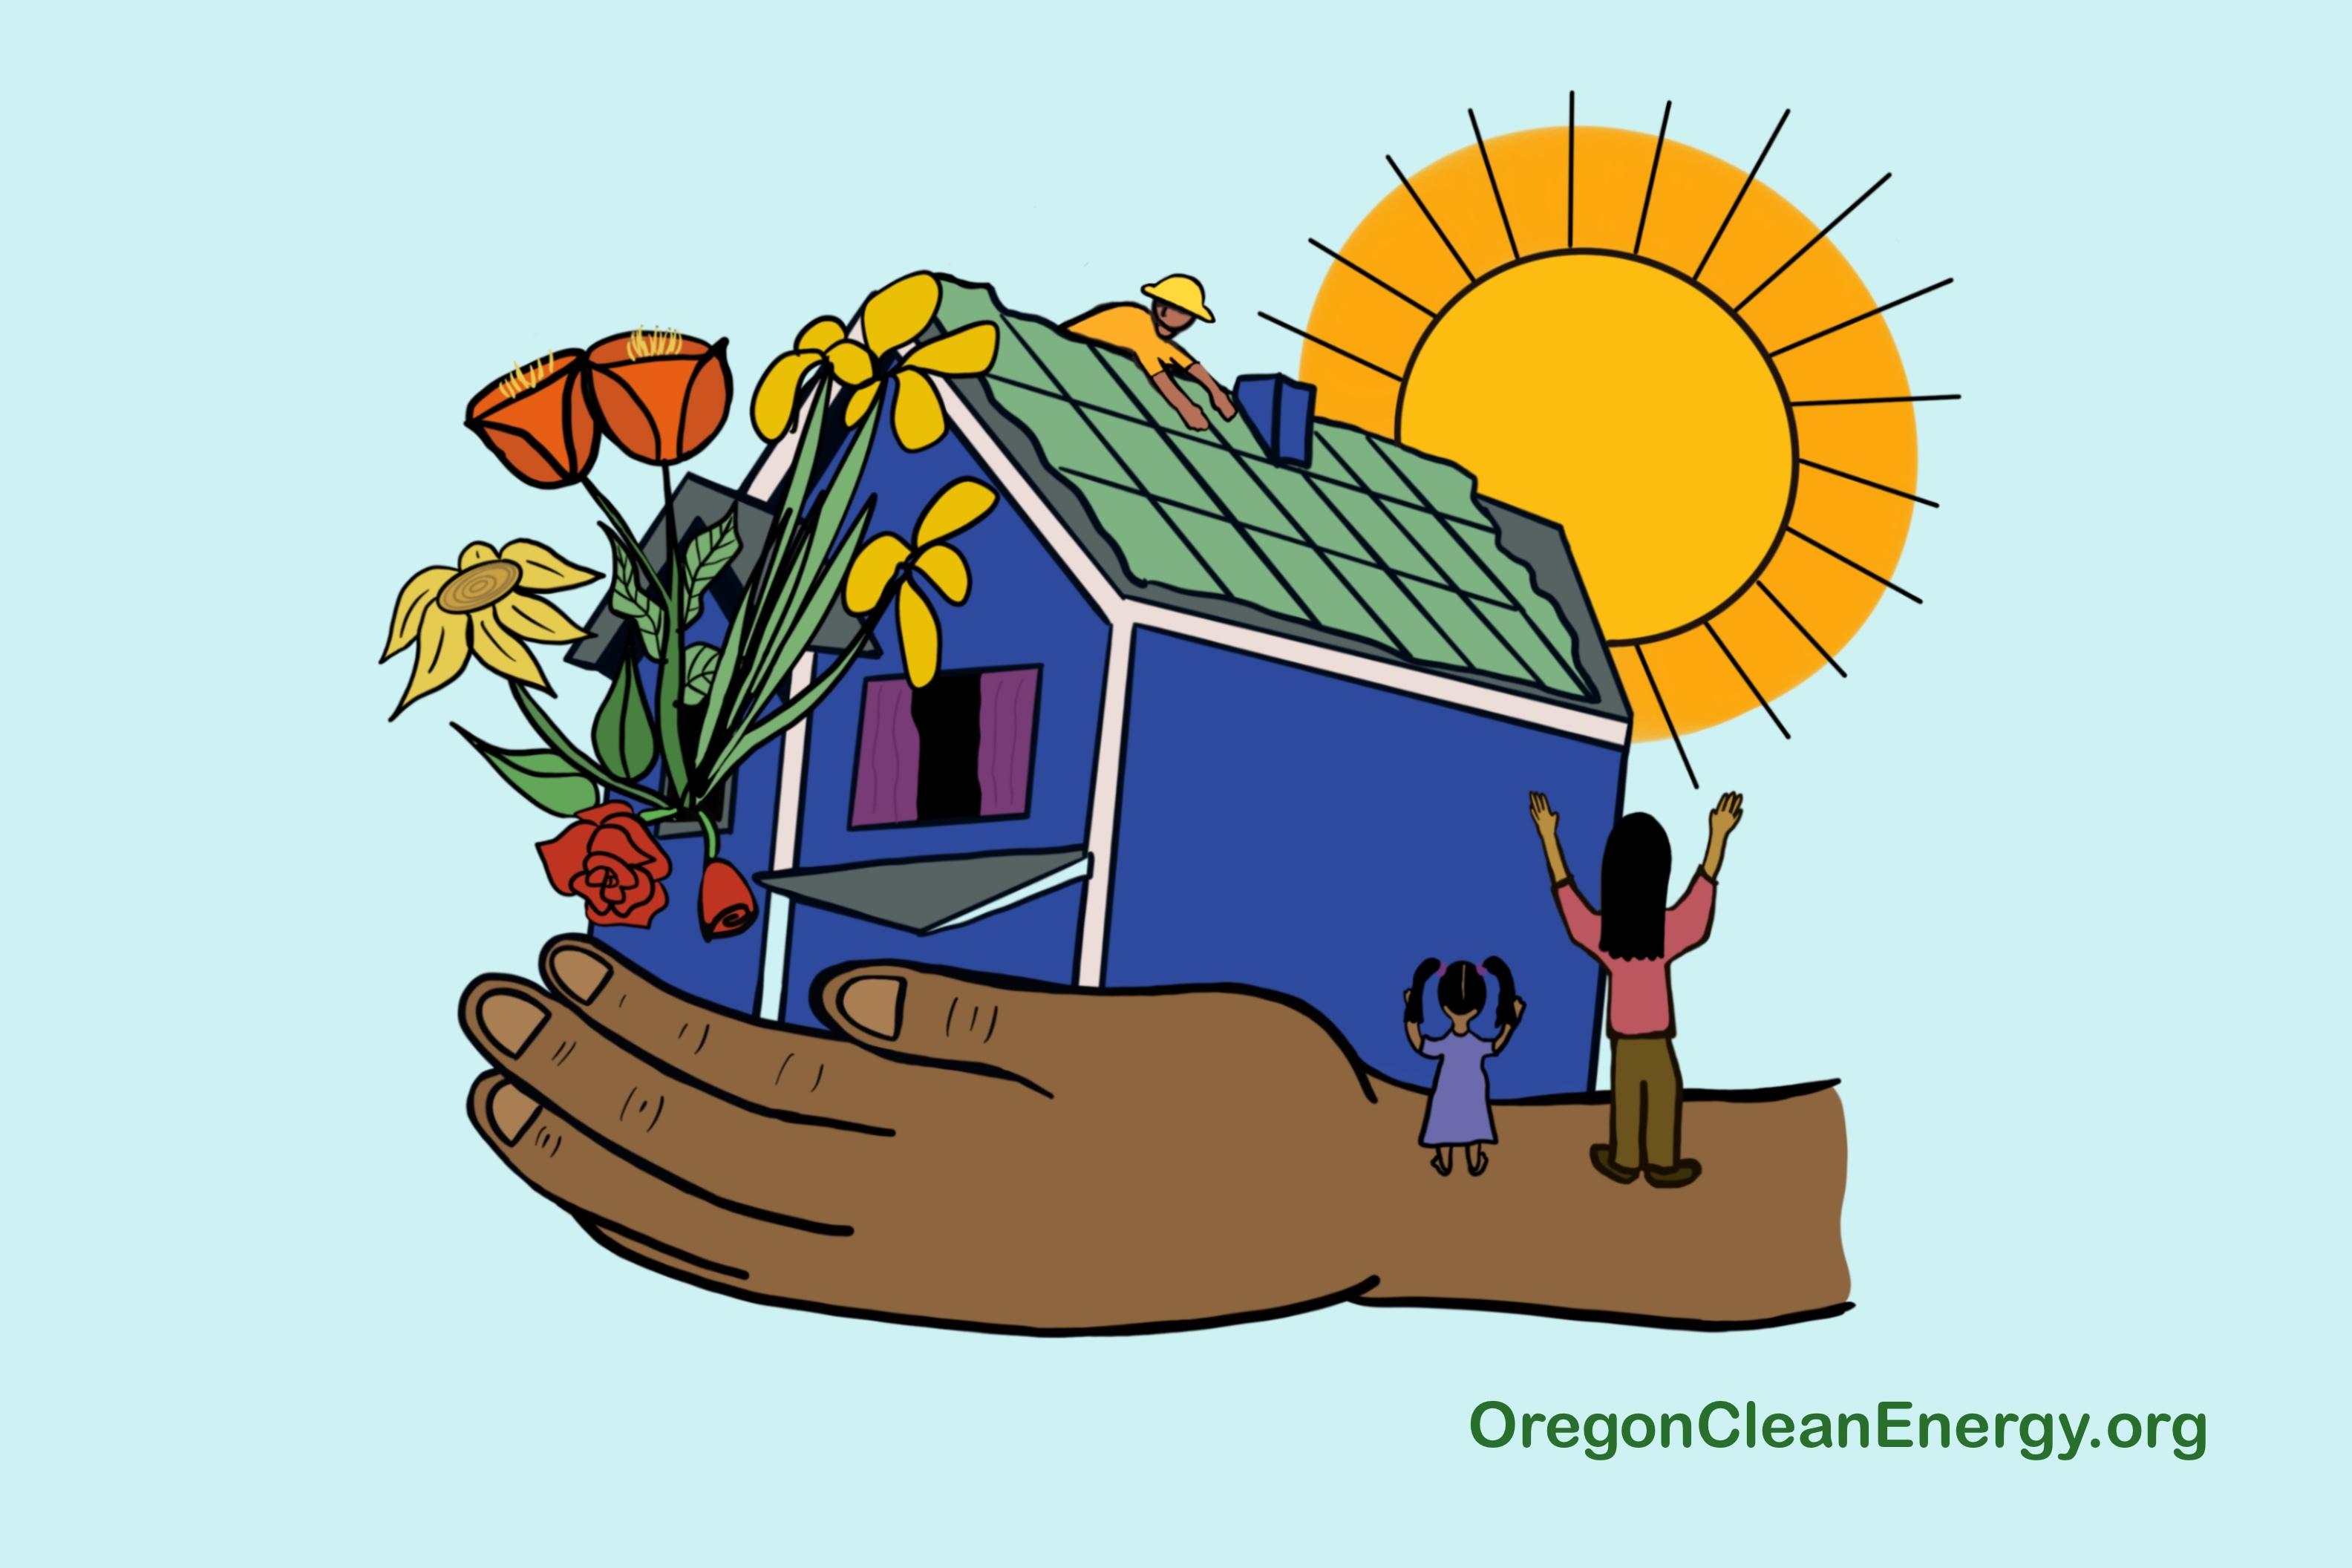 Oregon_clean_electricity_graphic_(artist_credit_Erica_Alexia_Ledesma).jpg